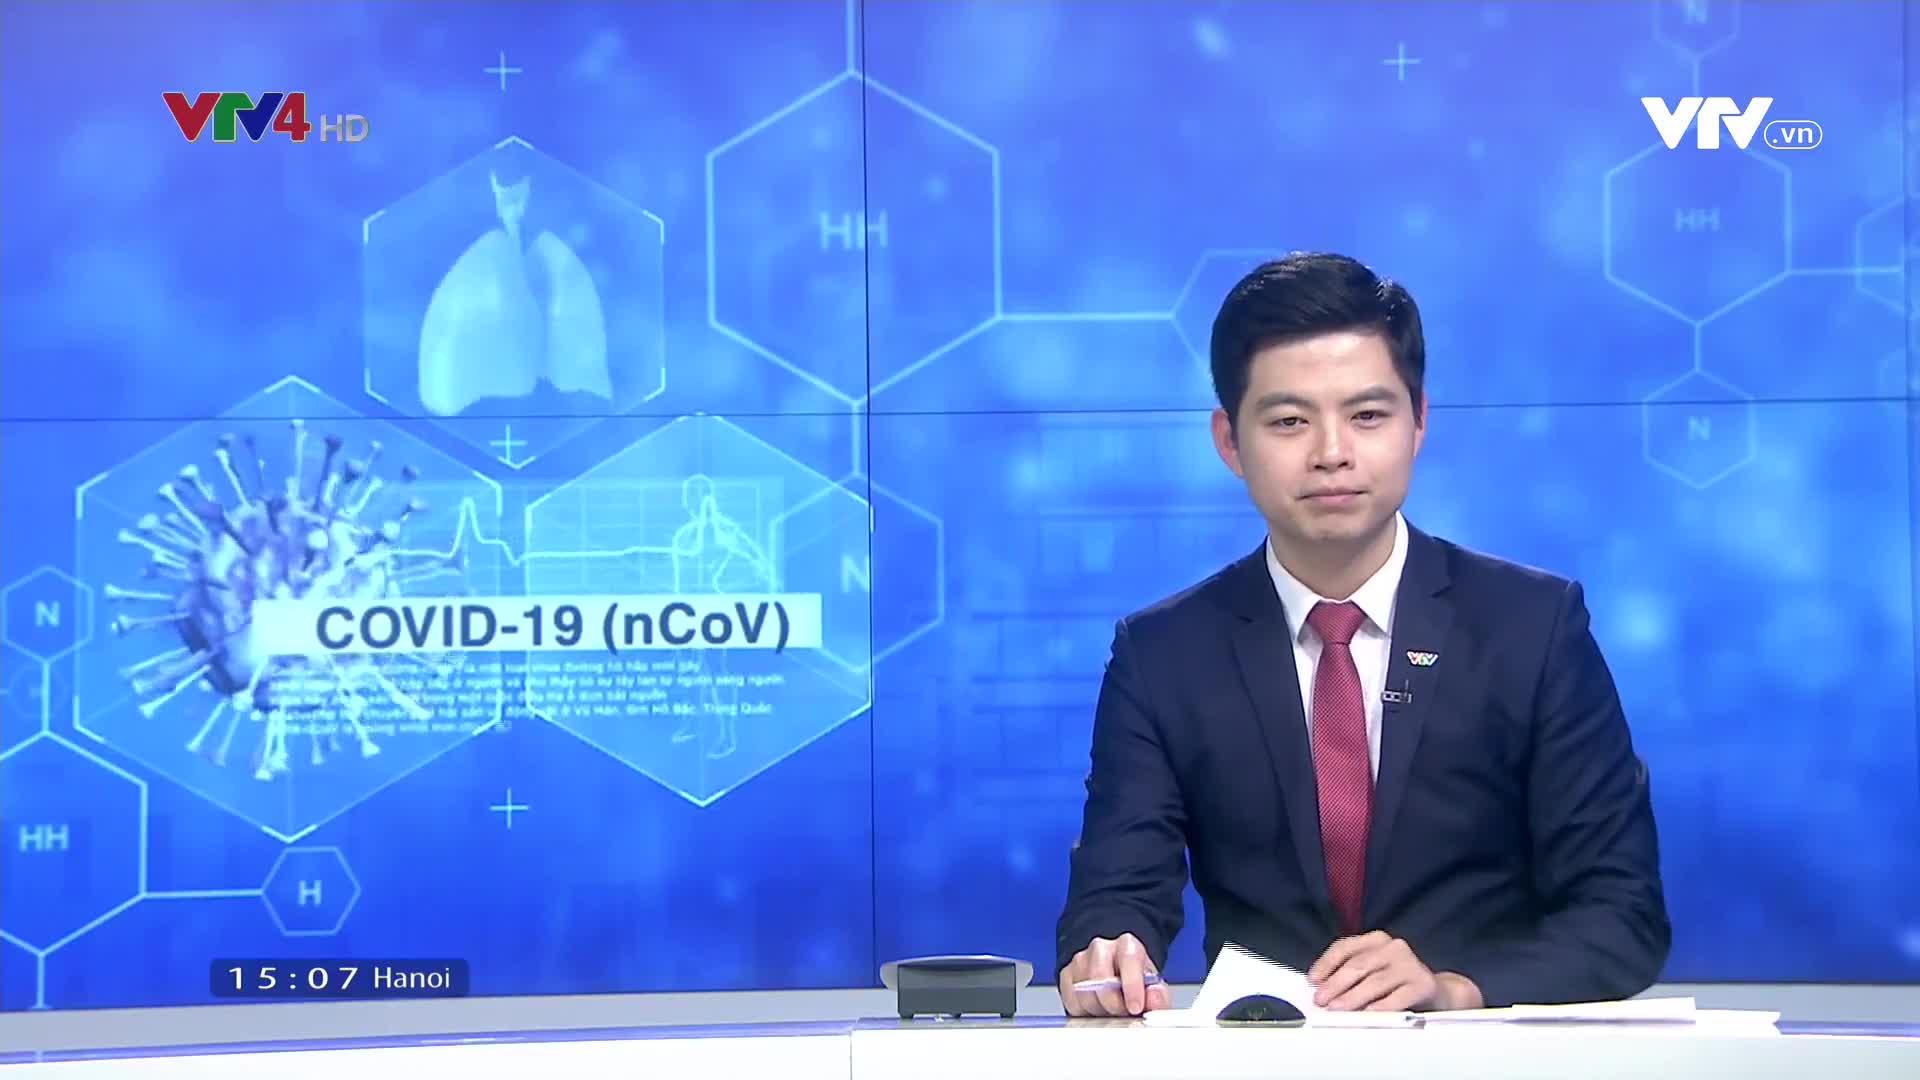 News 3 PM - 02/22/2020